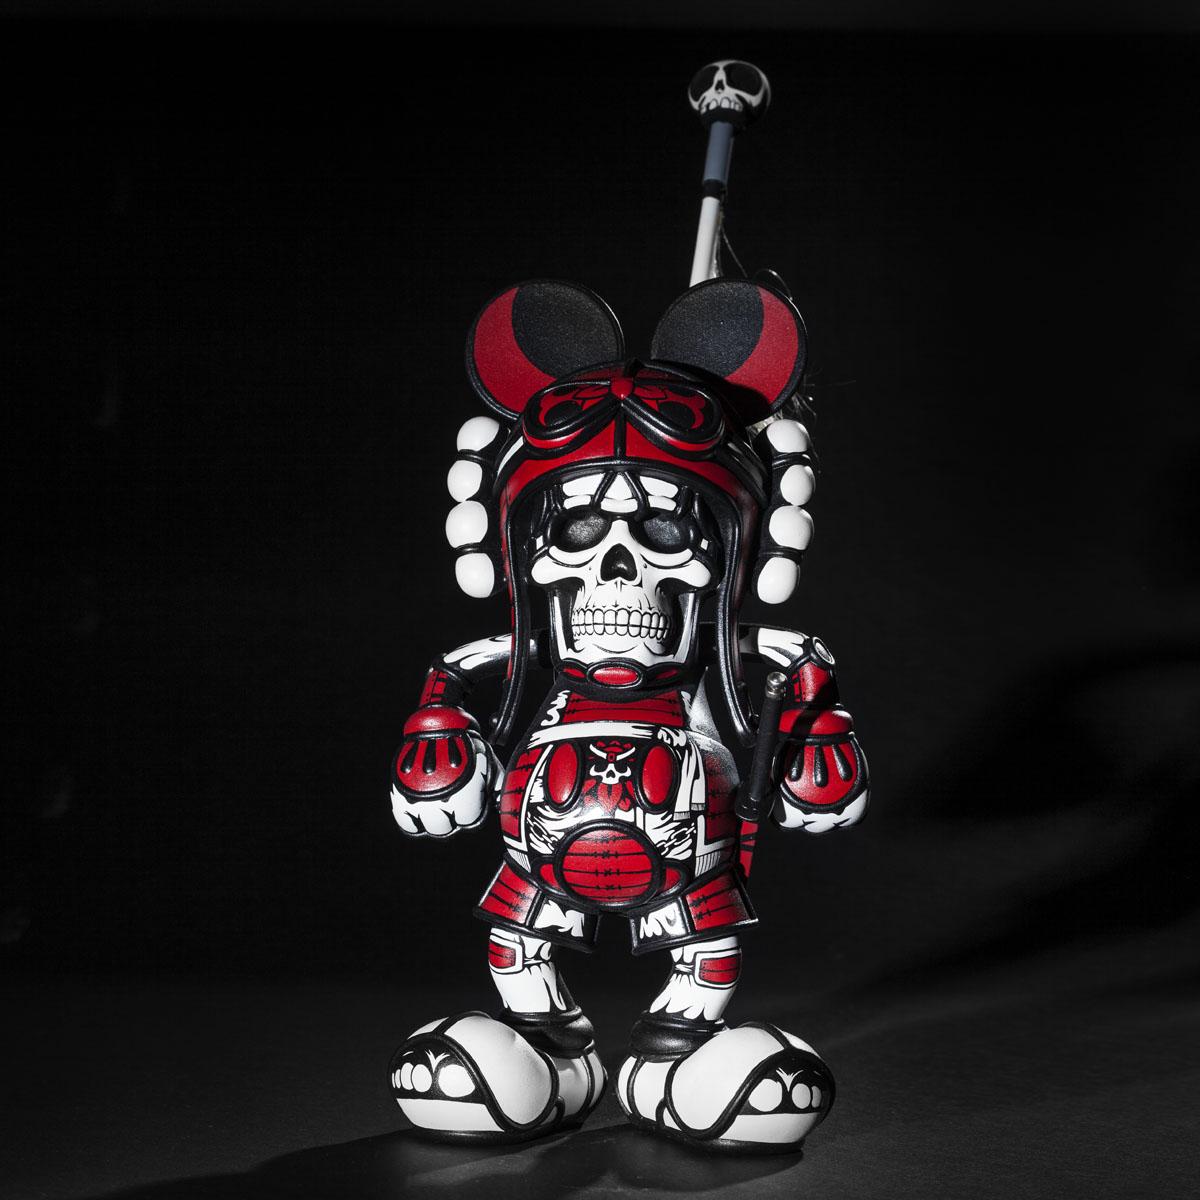 Samurai Deathshead custom by Jon Paul Kaiser black